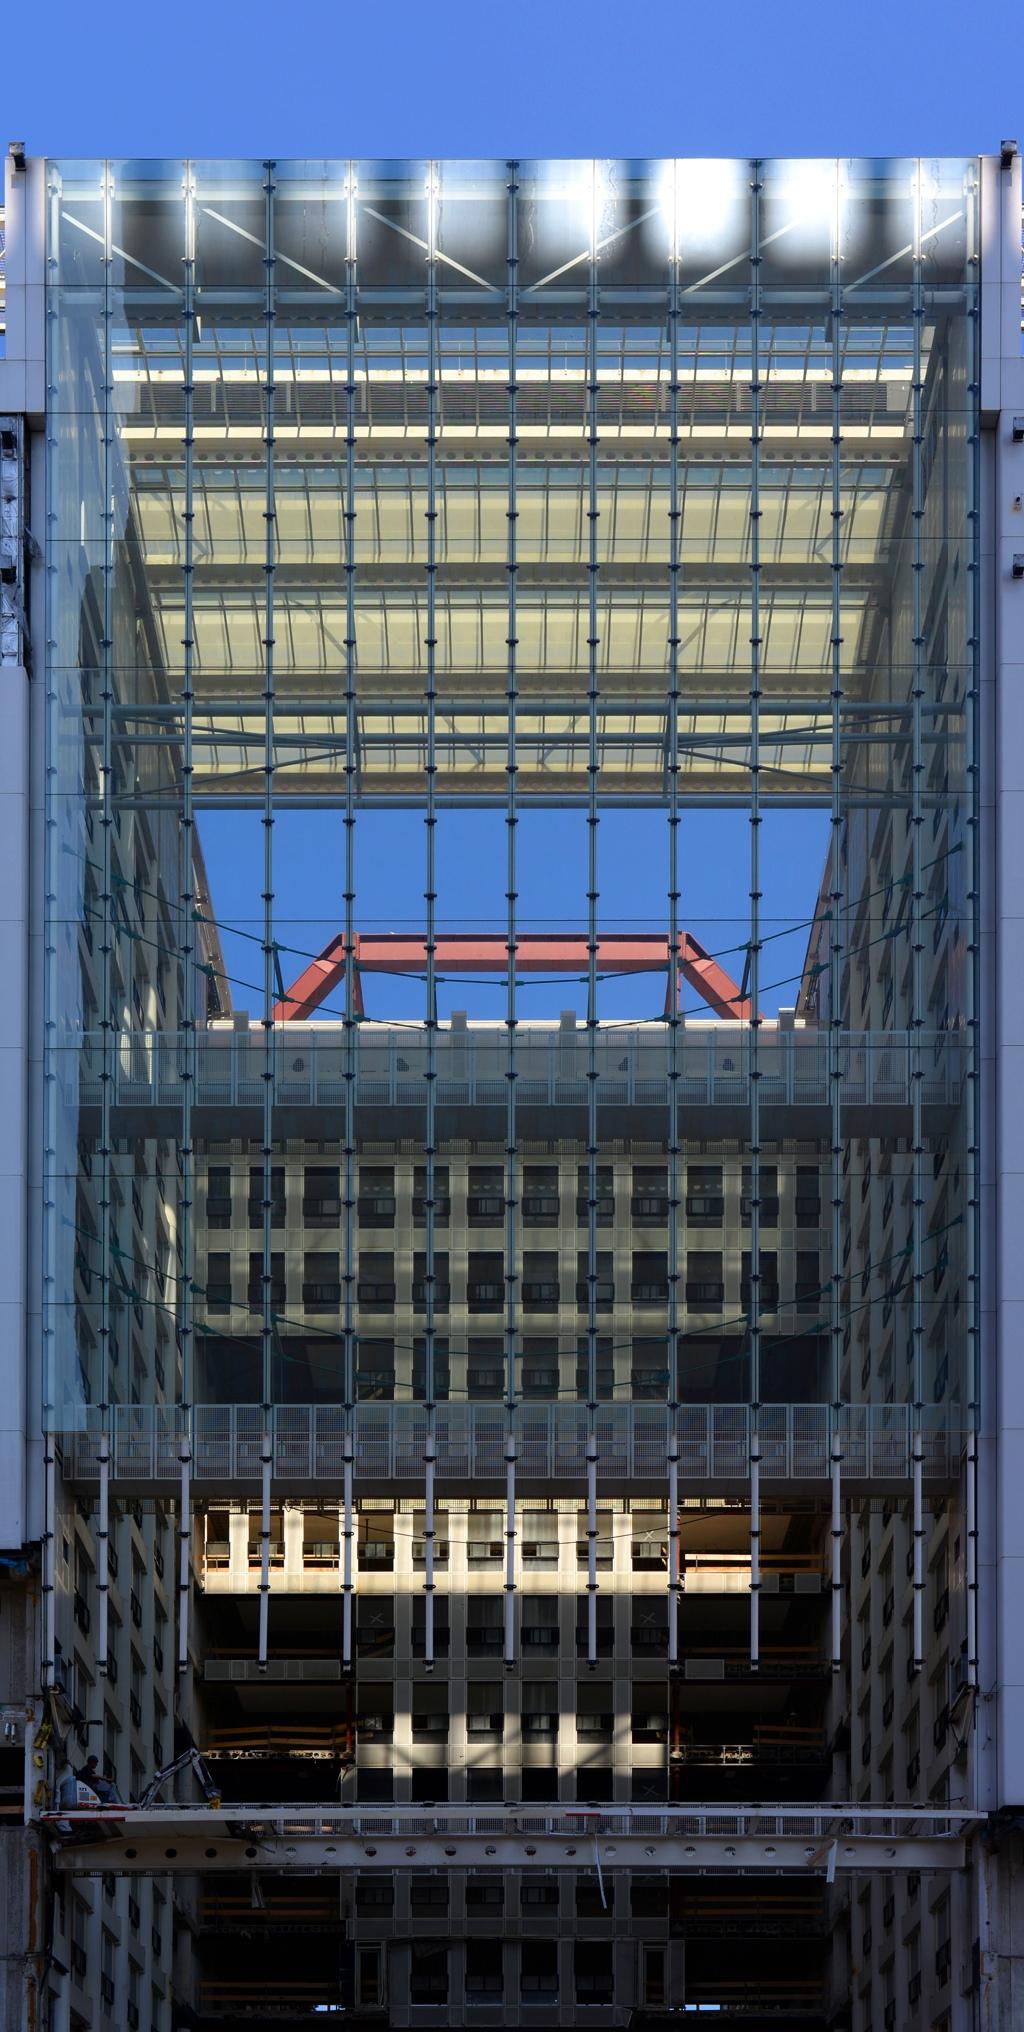 Studio-Kazerne-Photography-VROM-Den-Haag-10